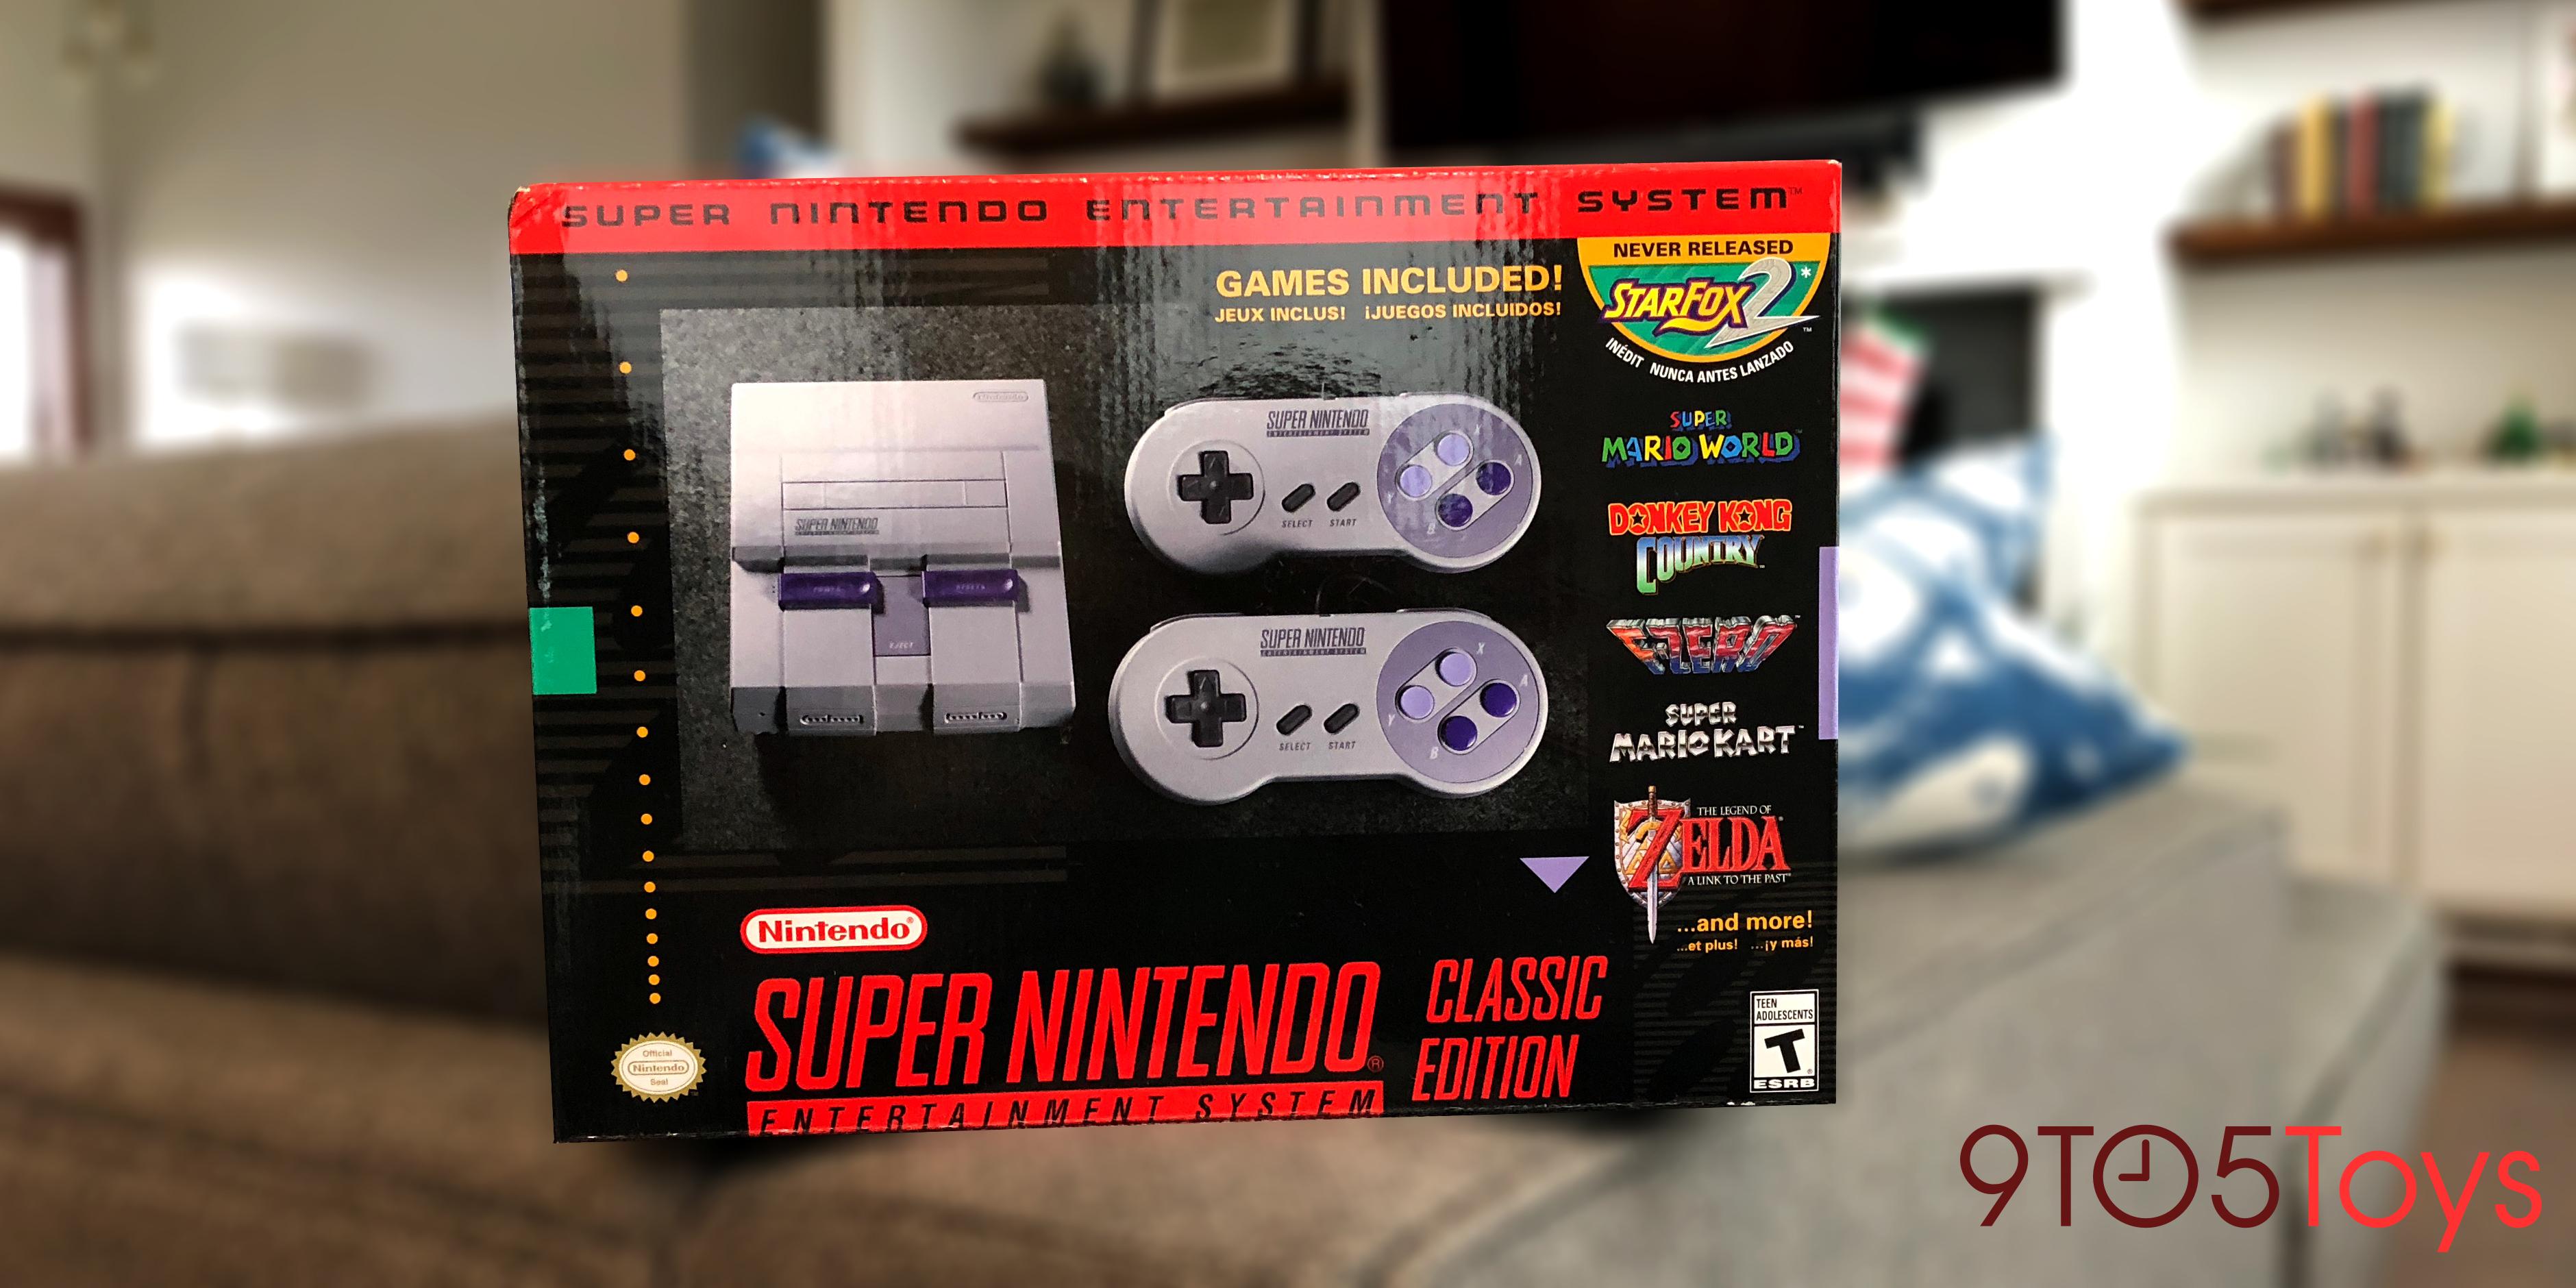 Snes Classic 24 Hr Giveaway Have Nintendo S Retro Console Under